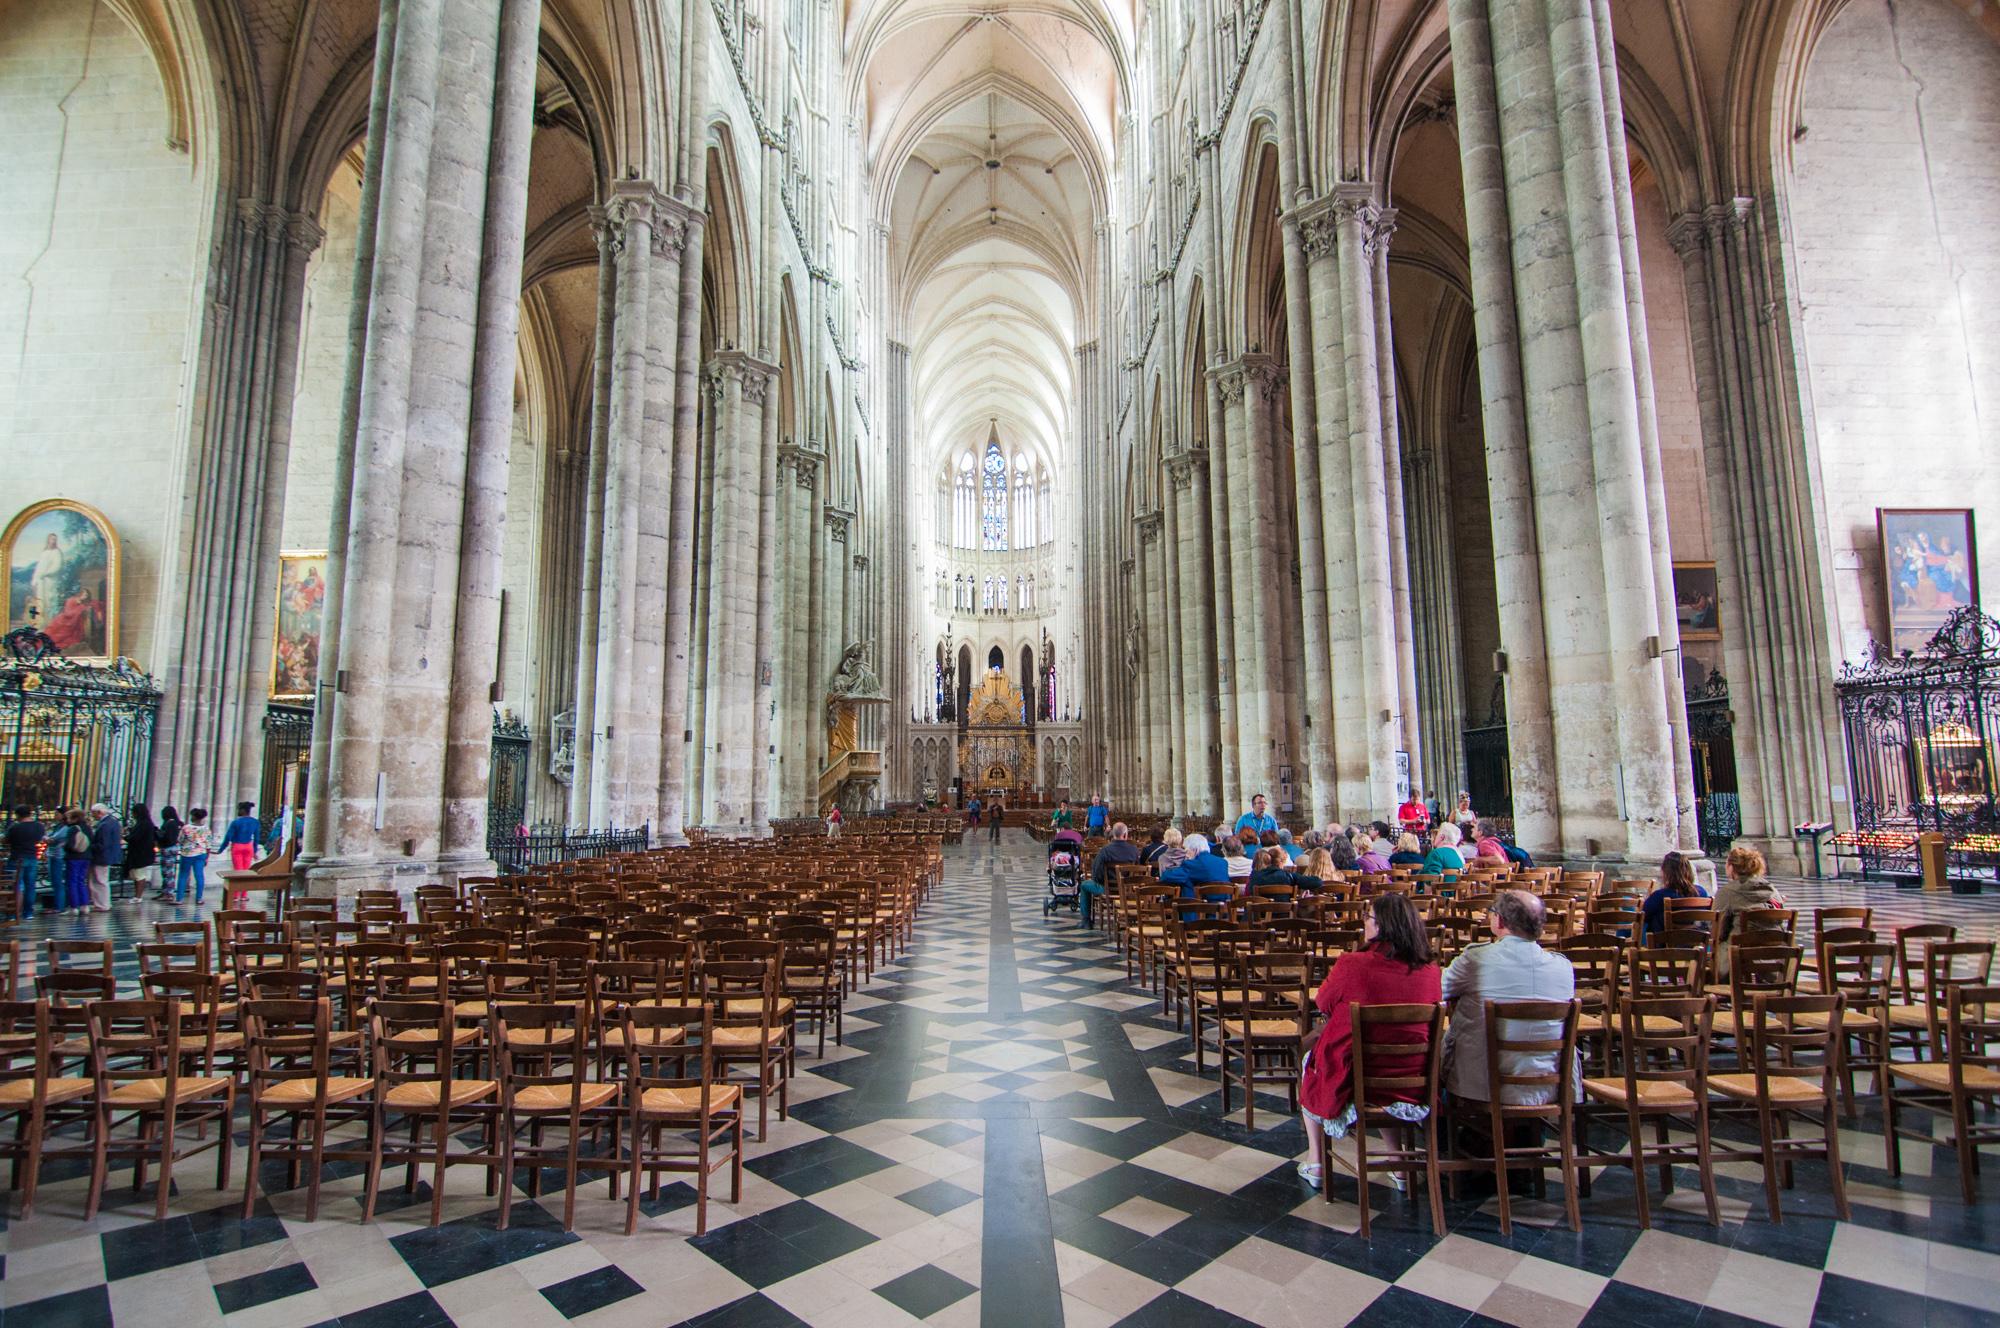 Amiens Cathedral at 40 min